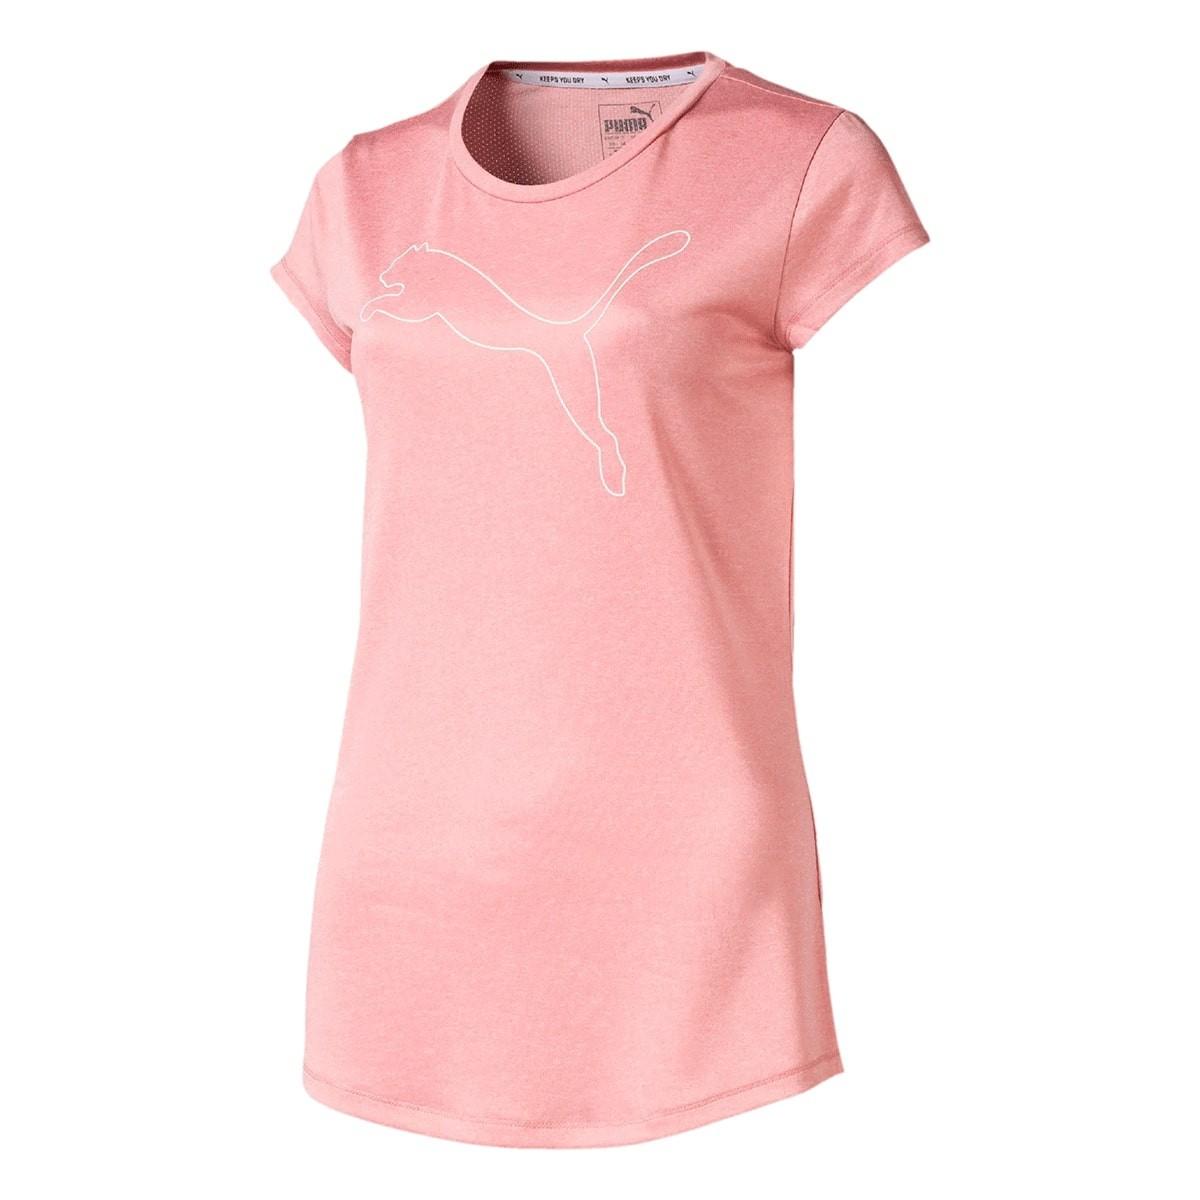 Camiseta Puma Active Heather Tee Feminina Rosa